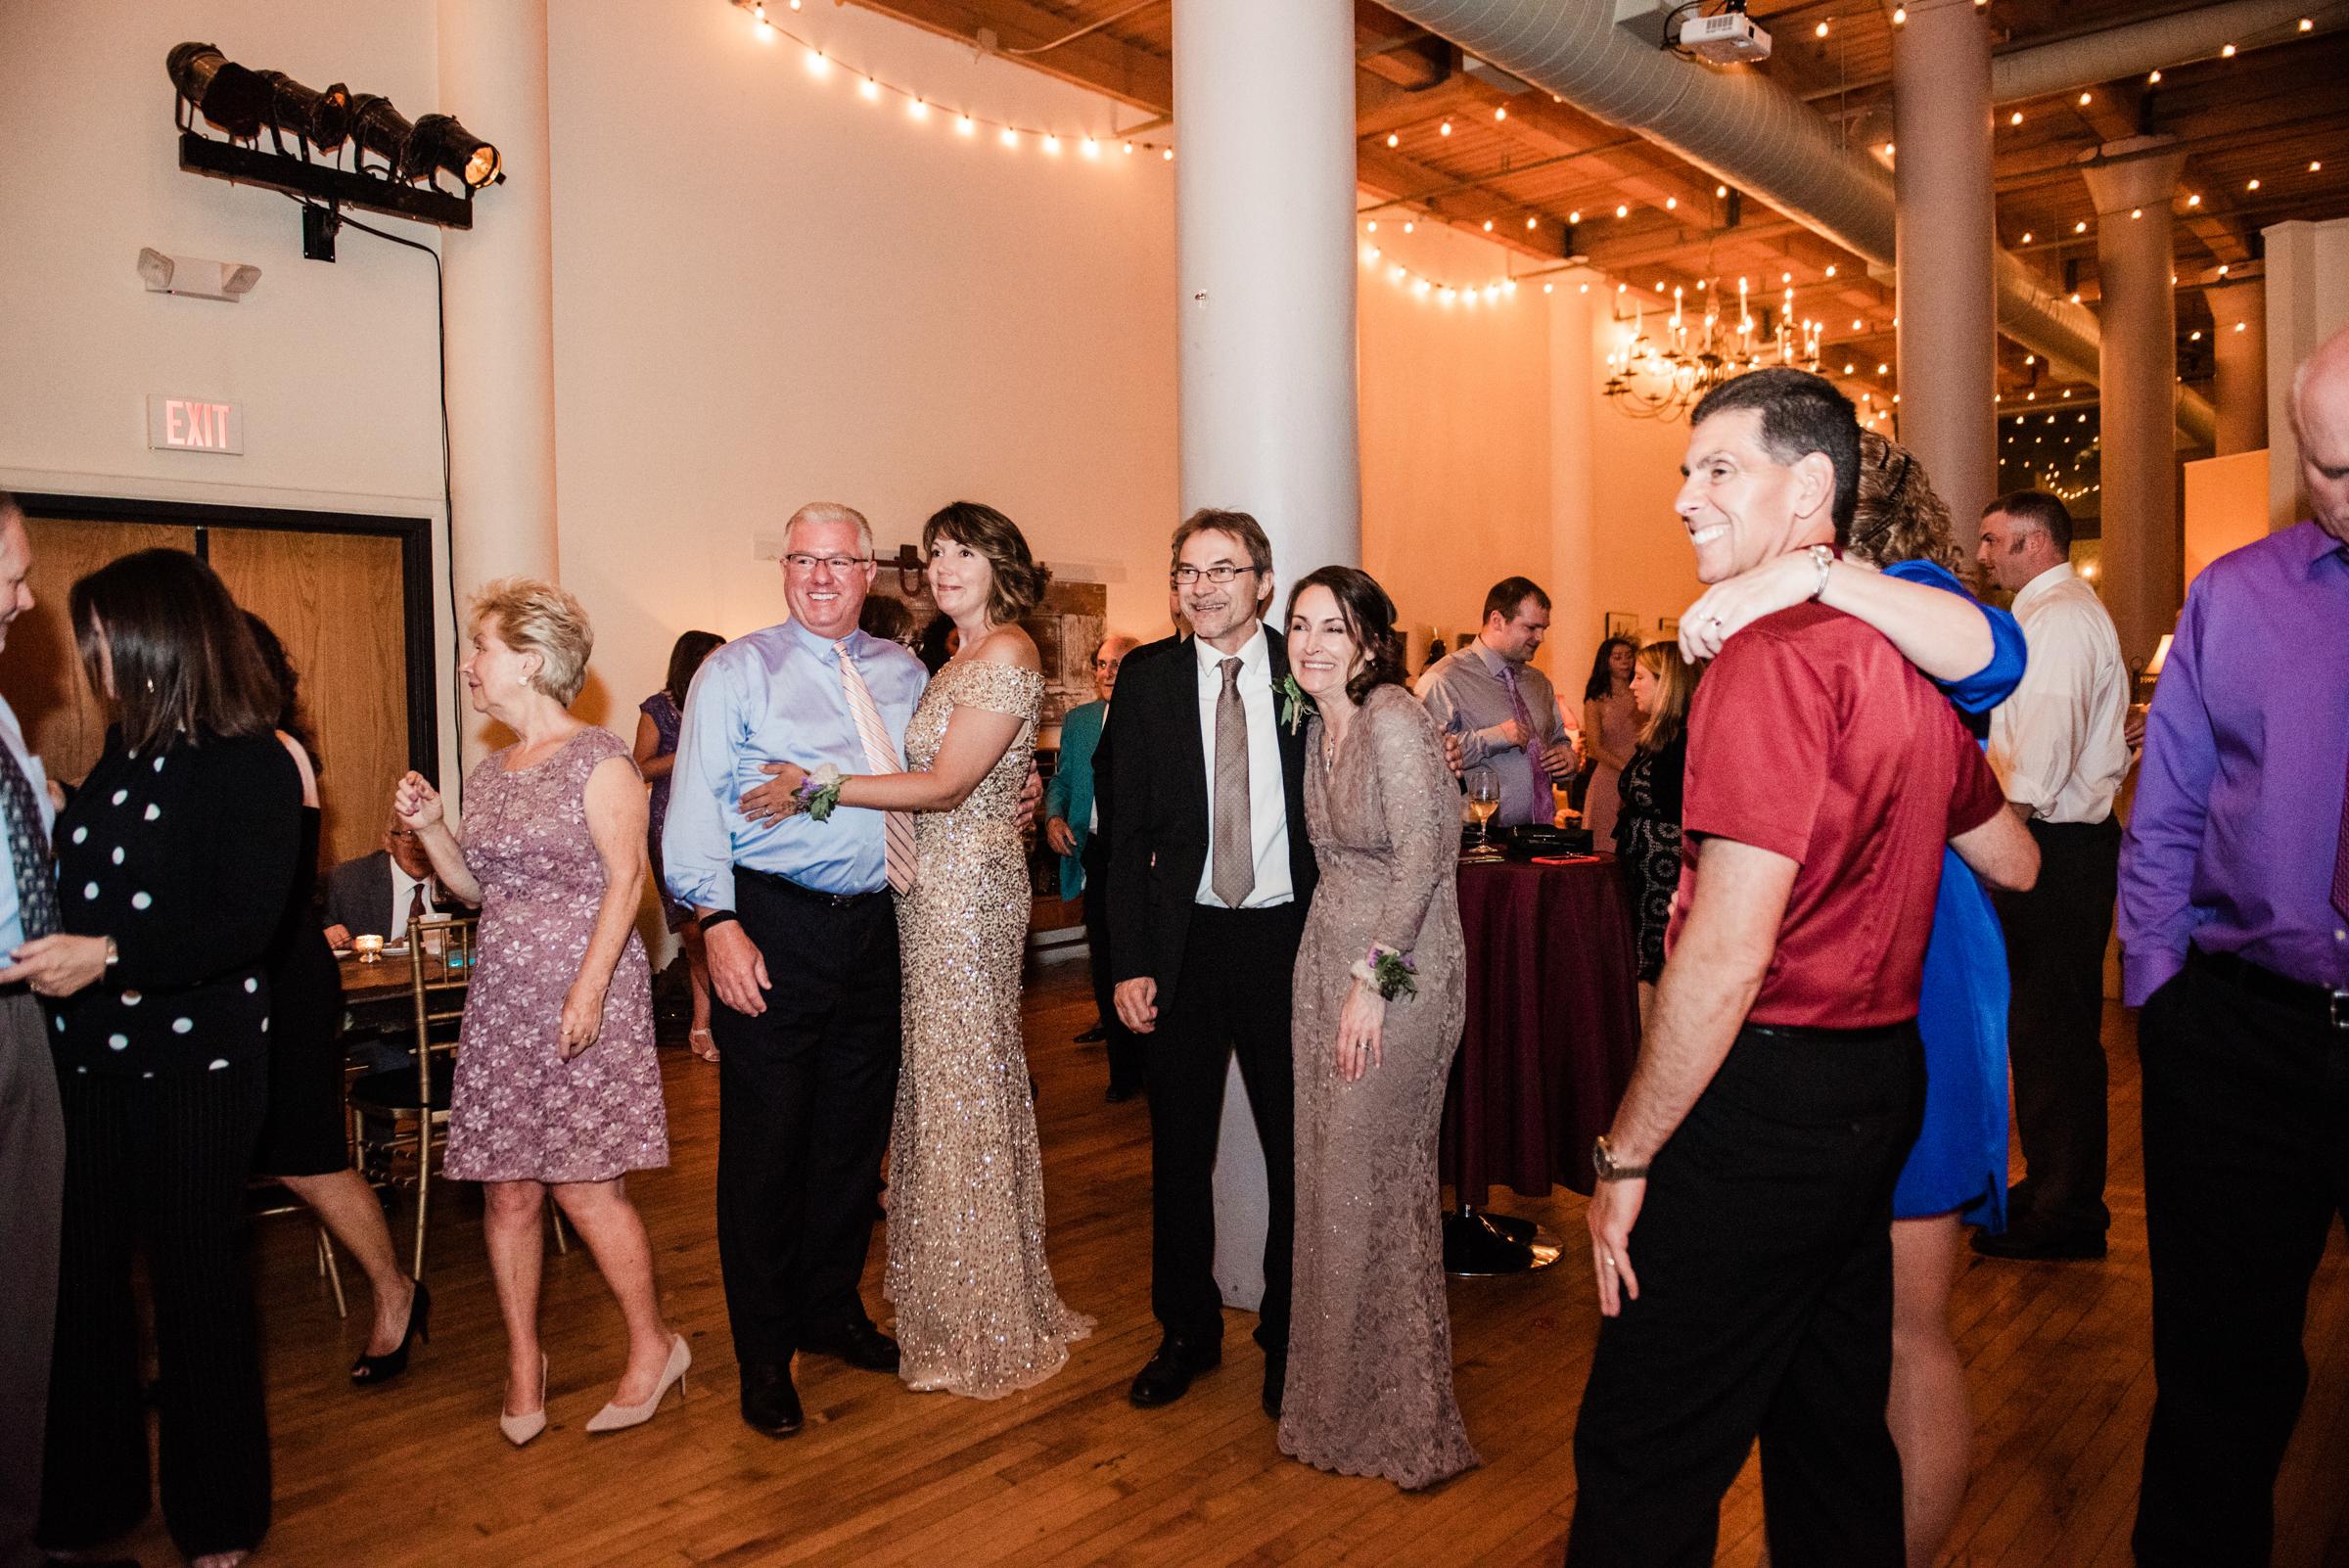 Studio_180_Lamberton_Conservatory_Rochester_Wedding_JILL_STUDIO_Rochester_NY_Photographer_DSC_9345.jpg